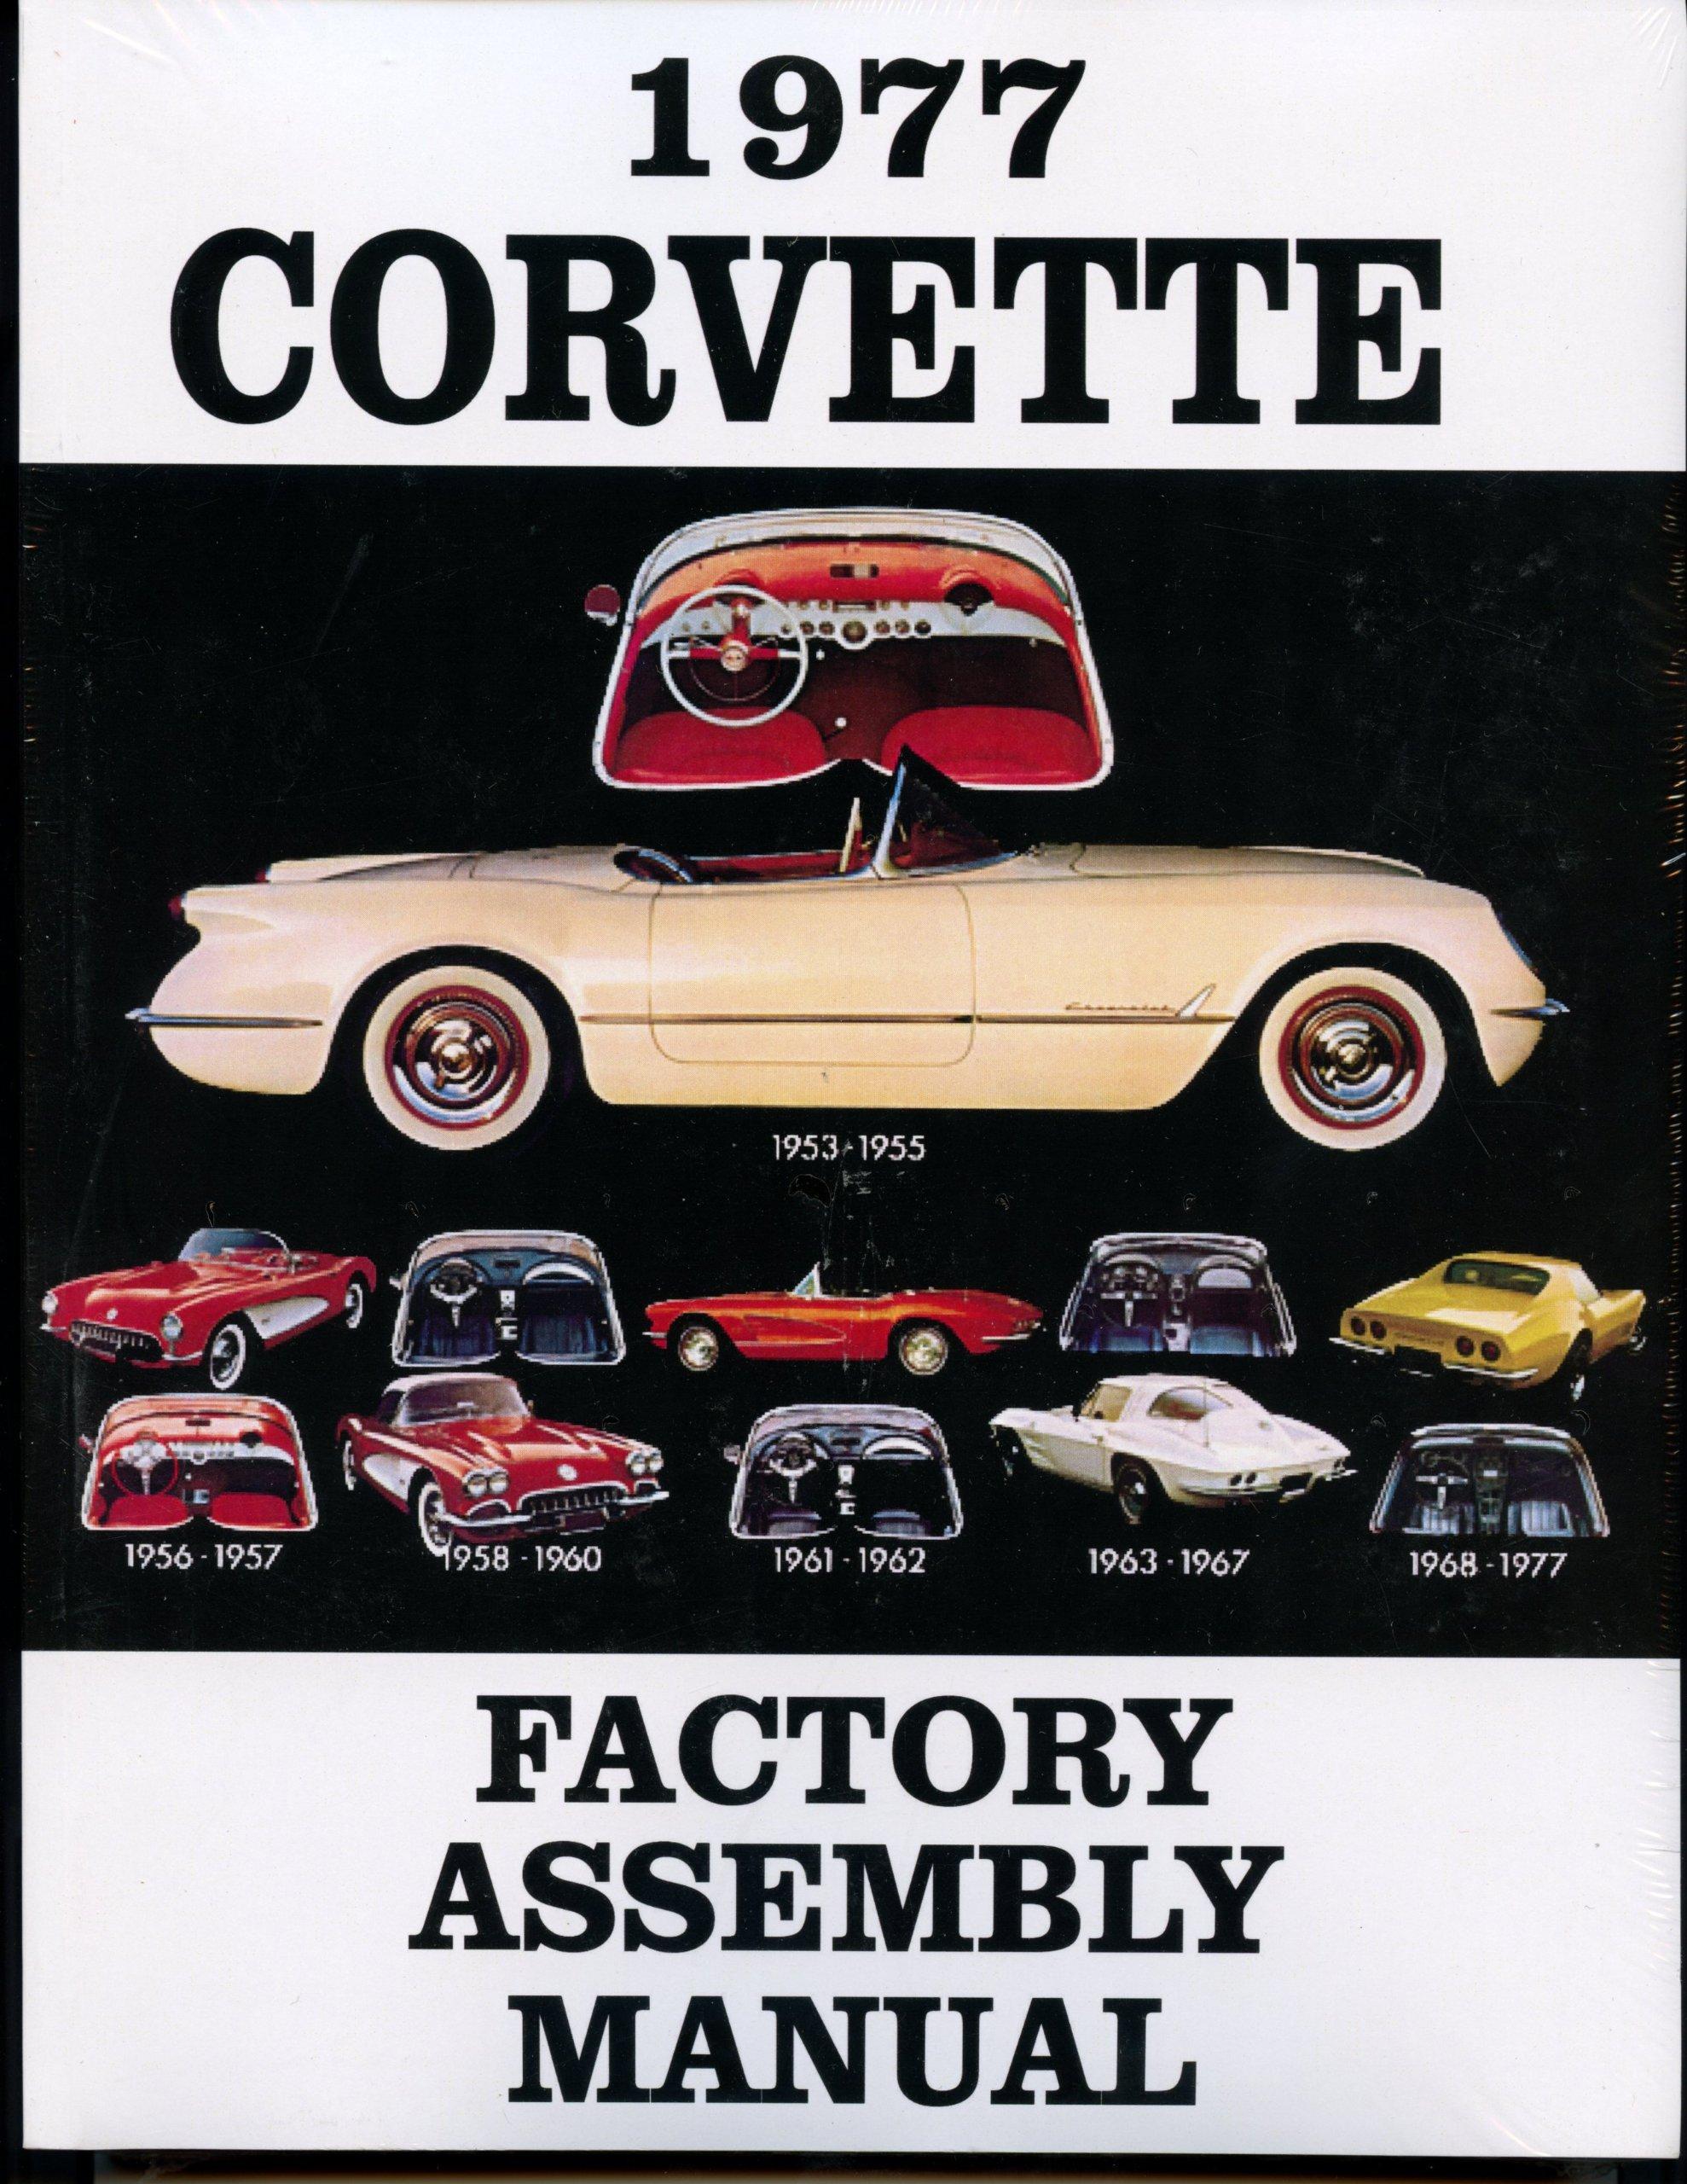 1977 corvette factory assembly manual chevrolet motor division rh amazon com 1972 corvette assembly manual 1972 corvette assembly manual